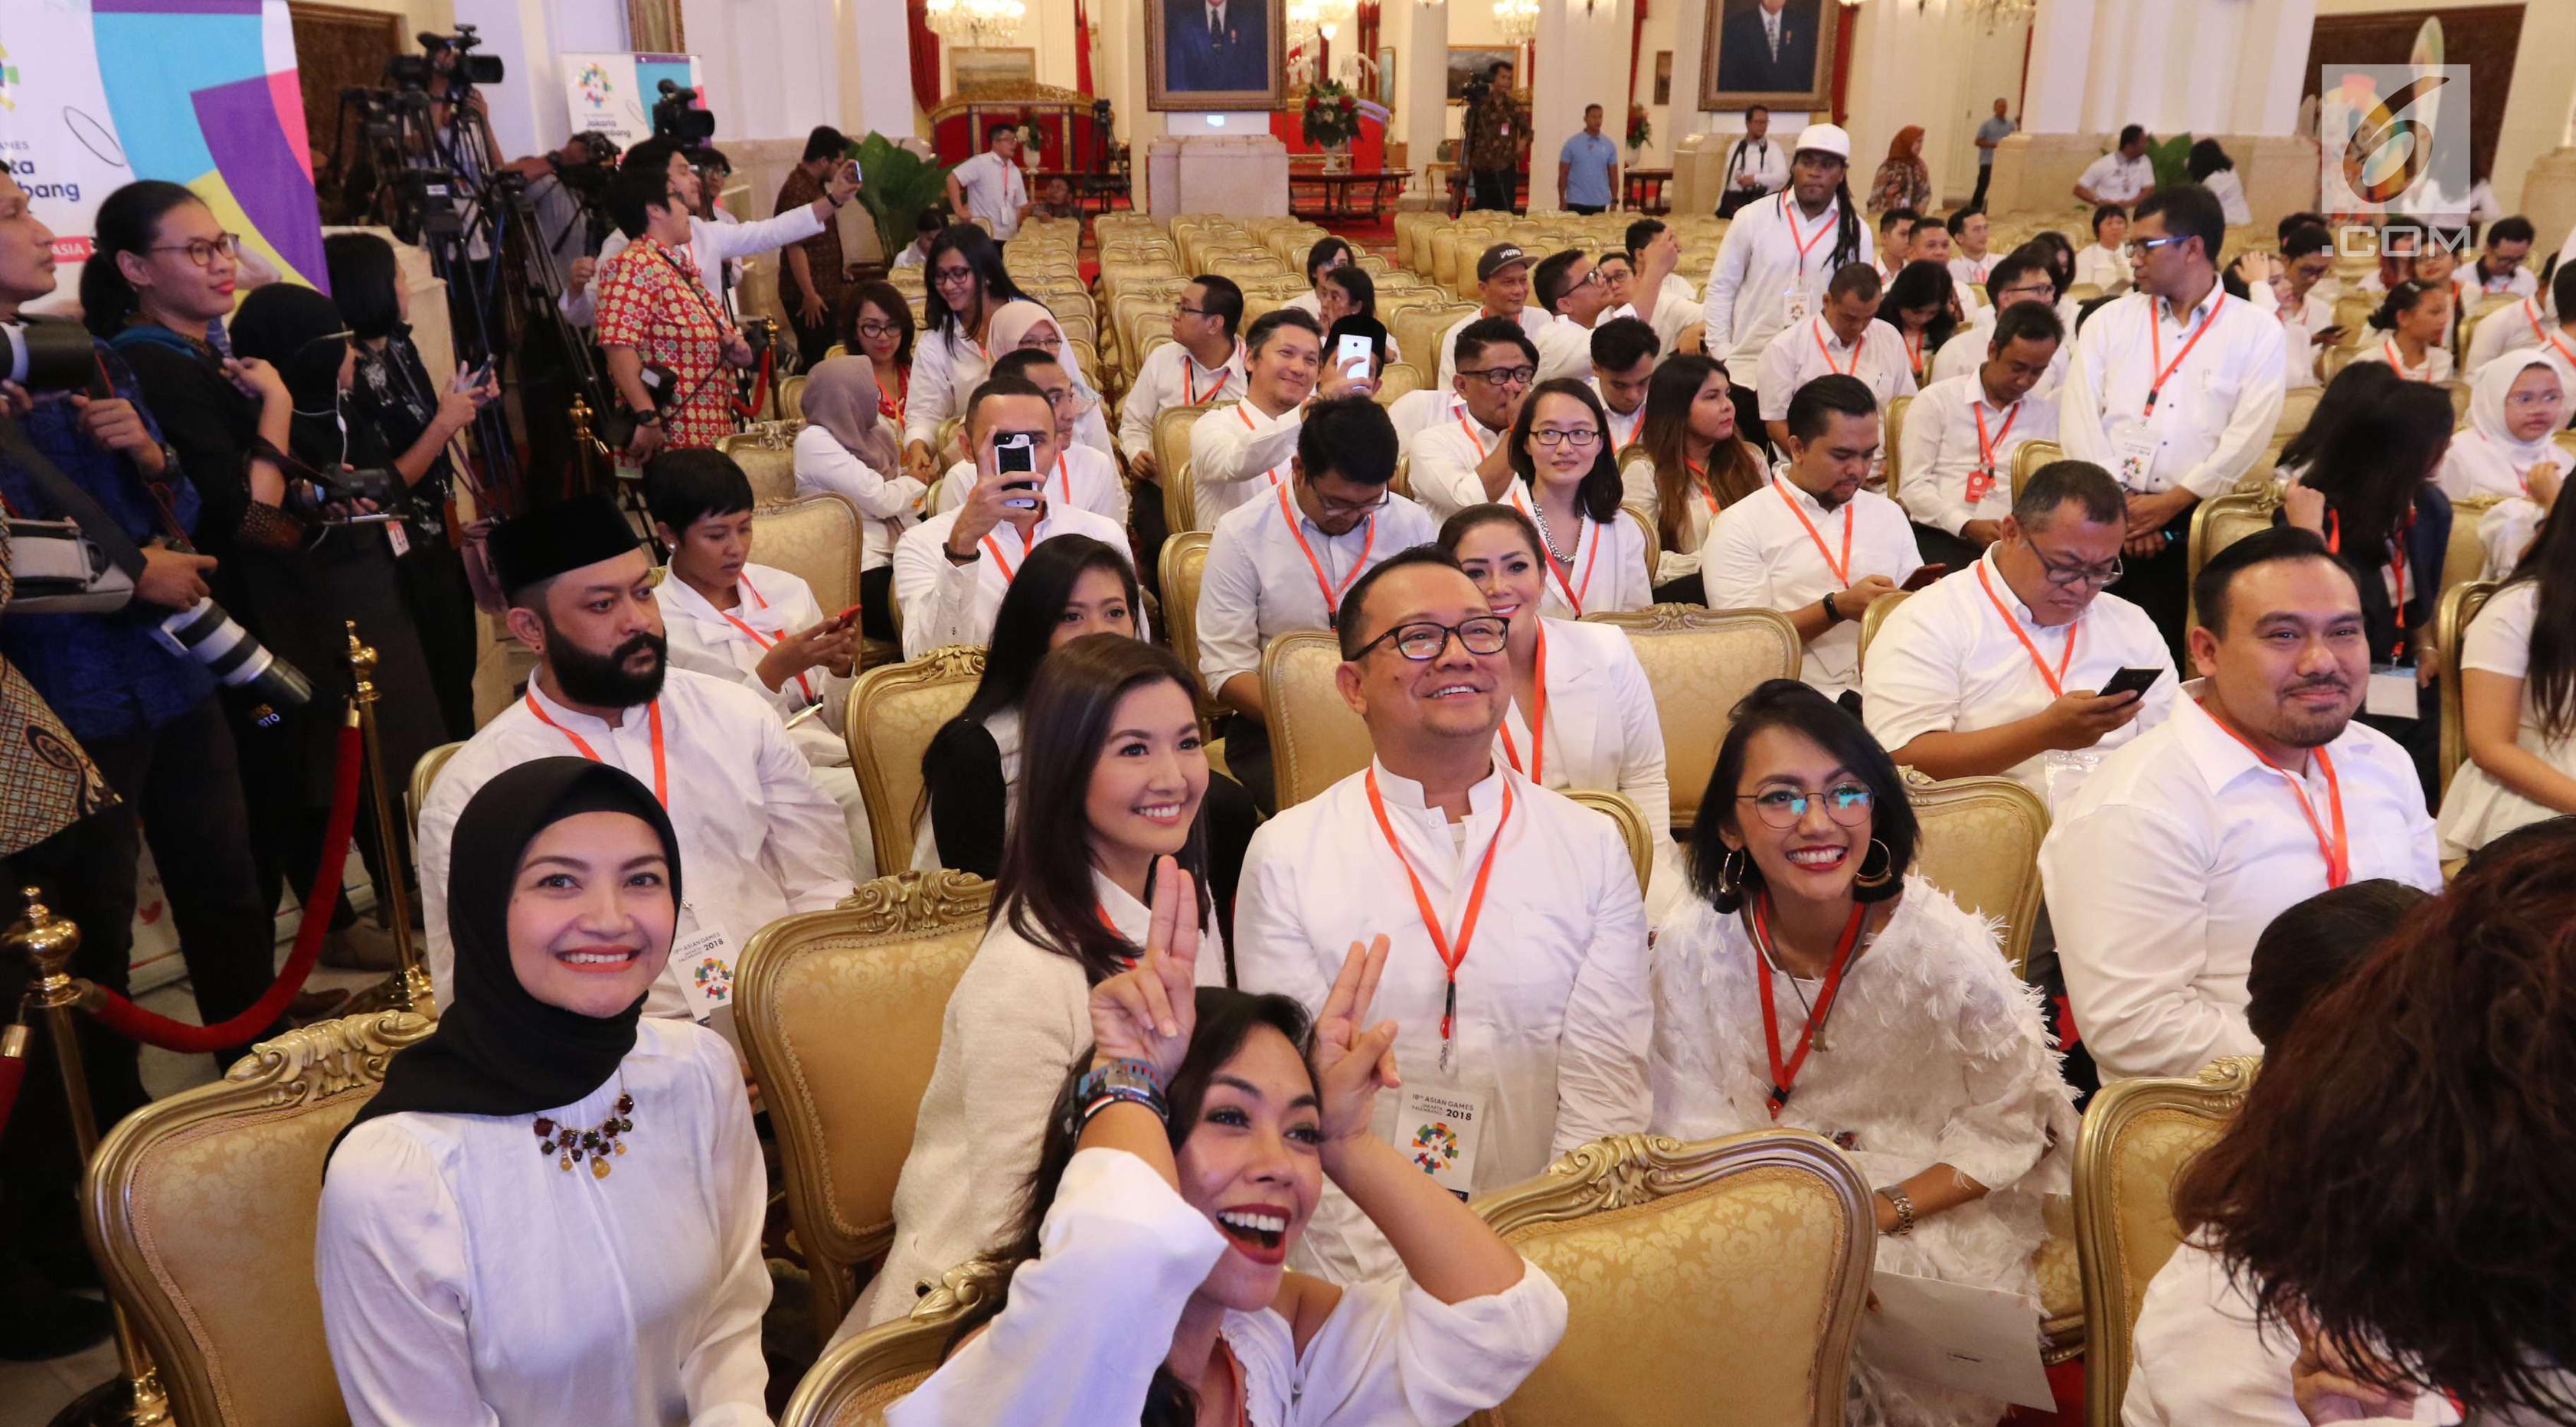 Sederet artis, musisi, vlogger dan pegiat kreatif menggelar pertemuan dengan Presiden Joko Widodo di Istana Negara, Jakarta, Selasa (5/6). Mereka diundang Presiden Jokowi dalam rangka promosi Asian Games 2018. (Liputan6.com/Angga Yuniar)